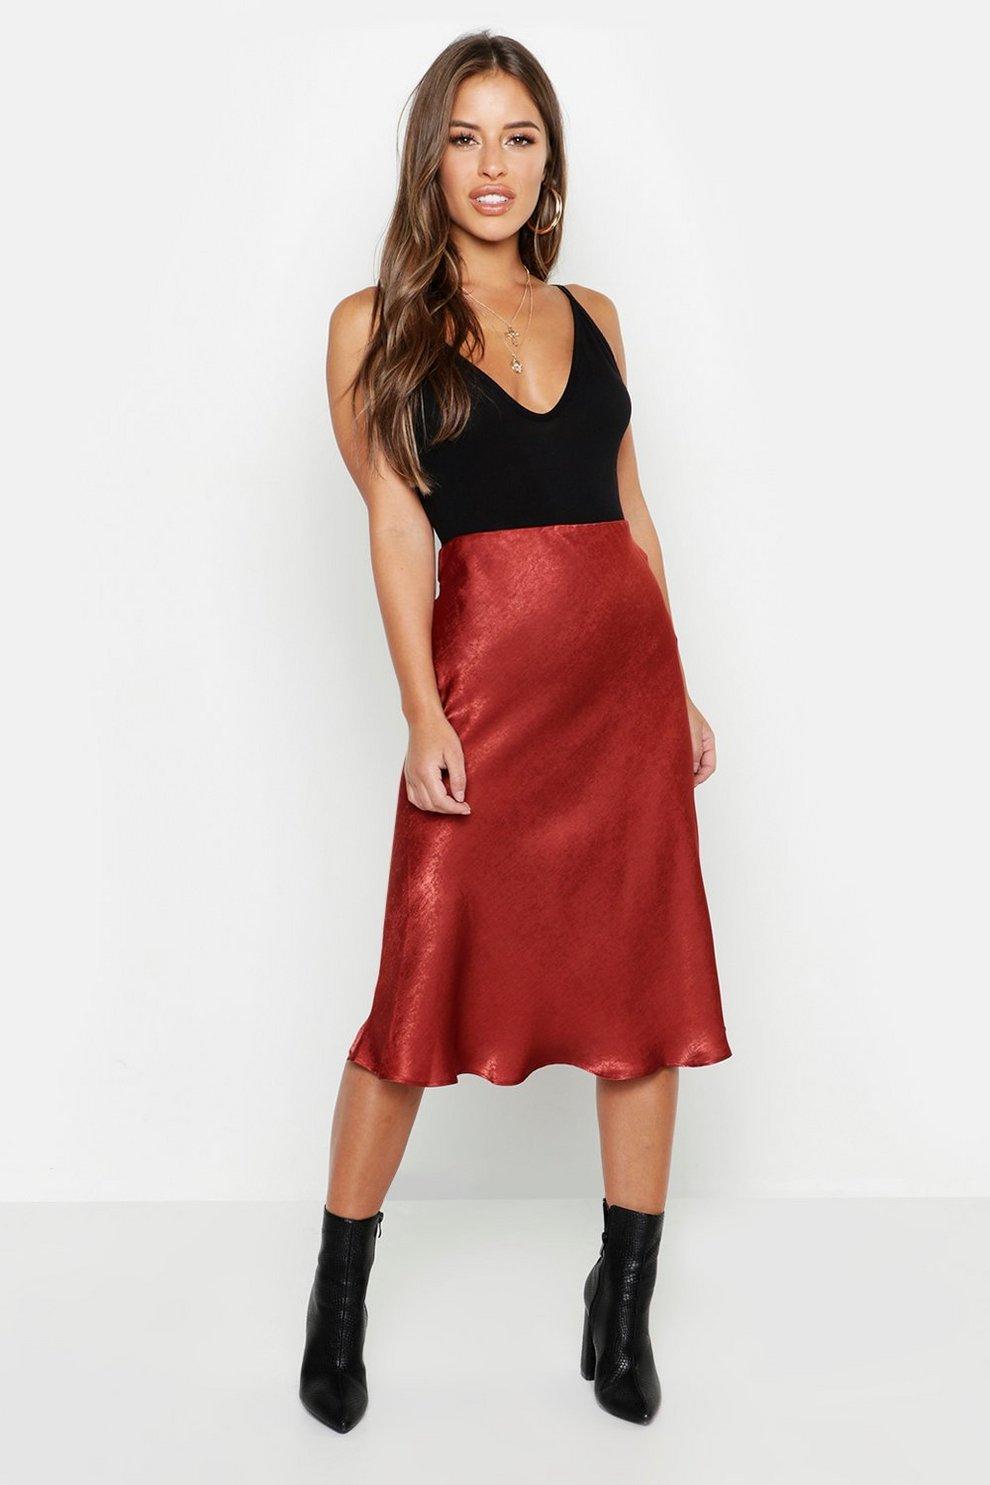 petite-rust-skirt-japan-sex